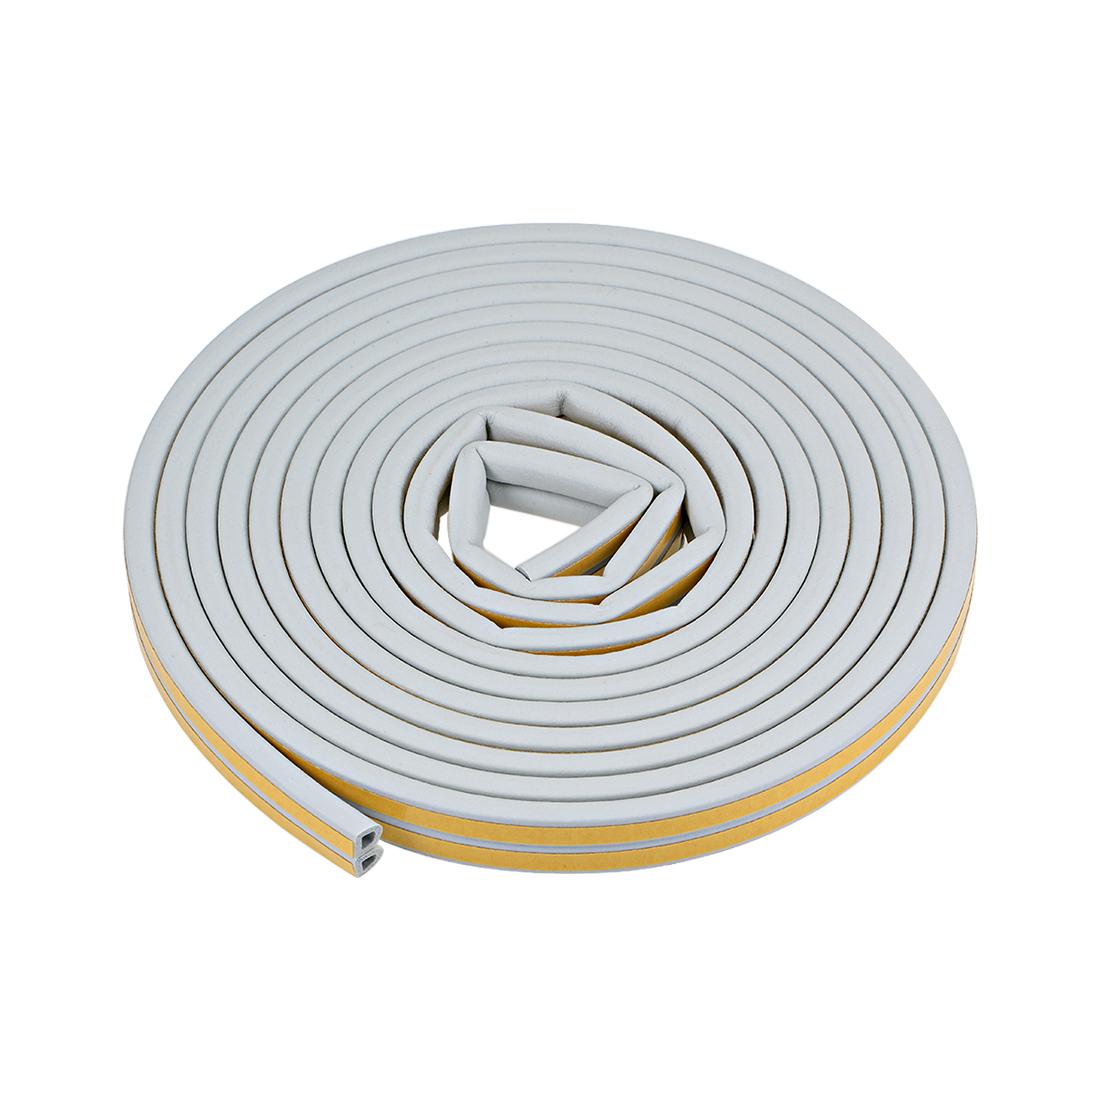 Foam Tape Self-Adhesive 9mm Width 7.5mm Thick, Total 26 Feet Gray 2Pcs